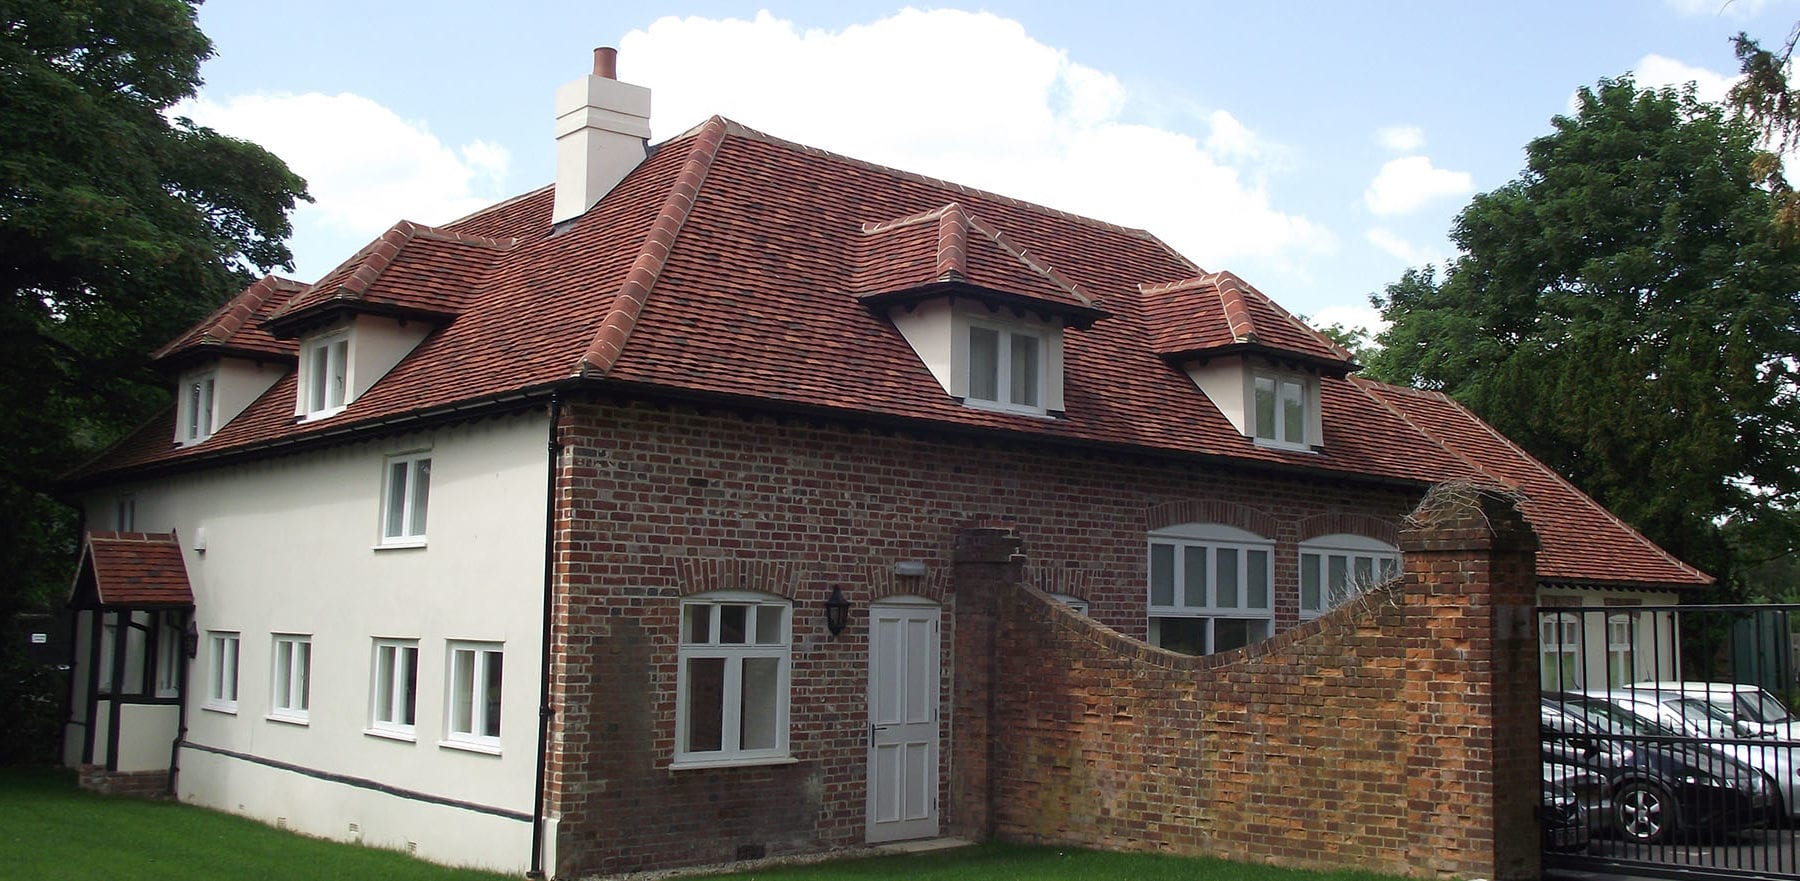 Lifestiles - Handmade Multi Clay Roof Tiles - Stanstead, England 3